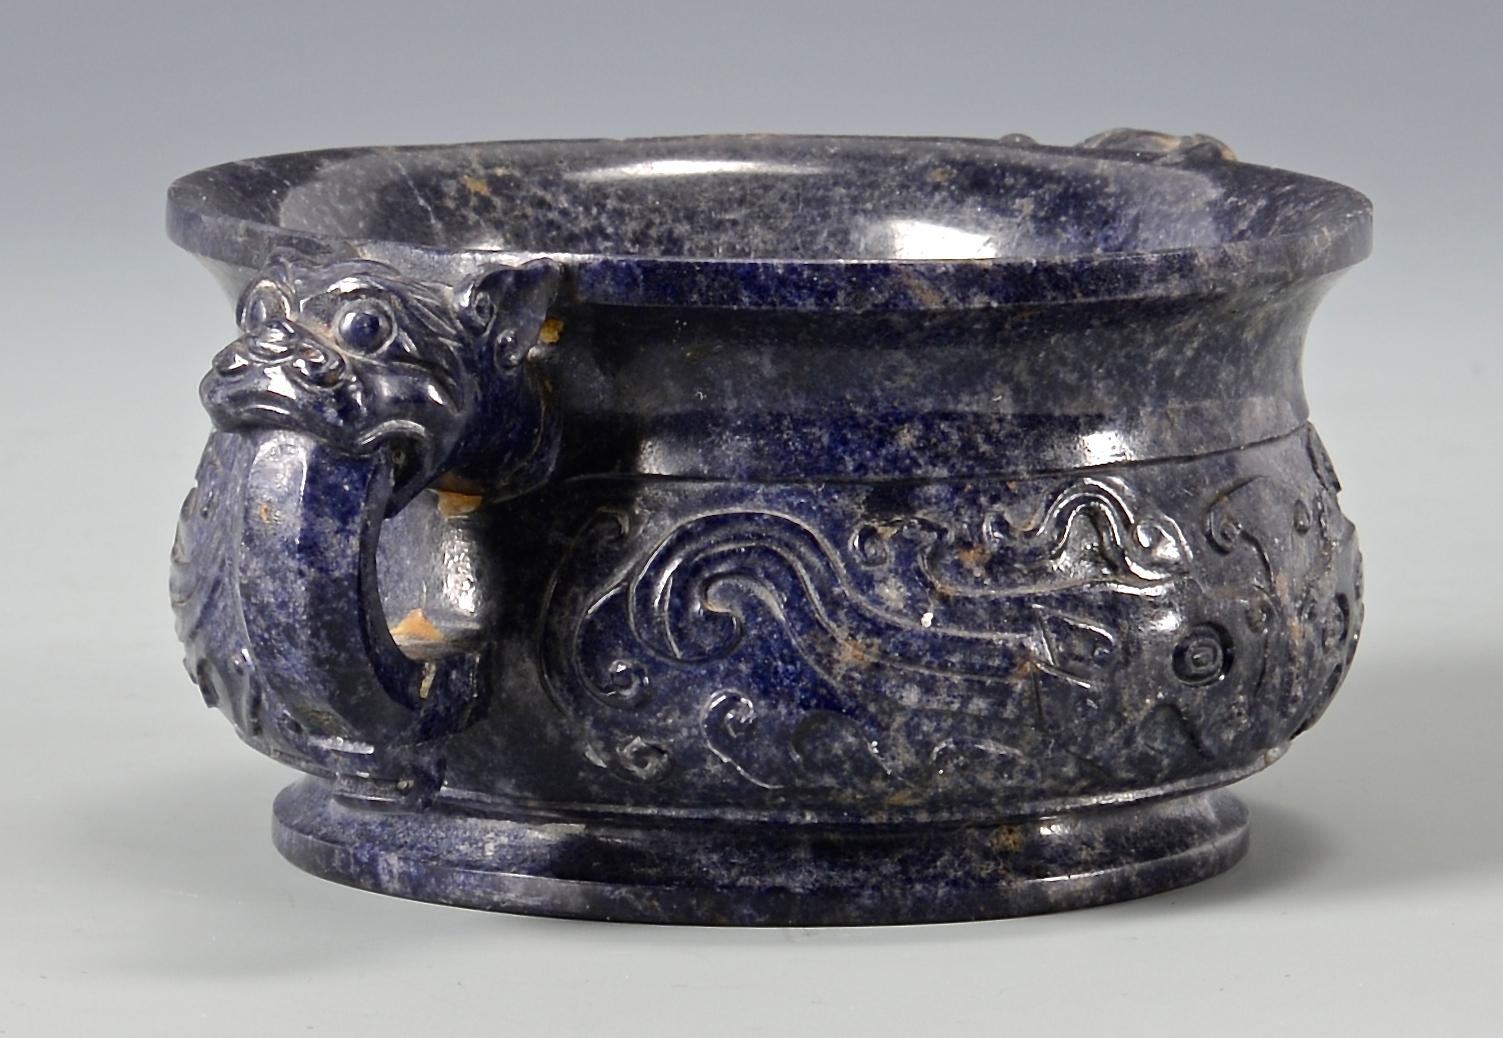 Lot 15: Lapis carved bowl or censer